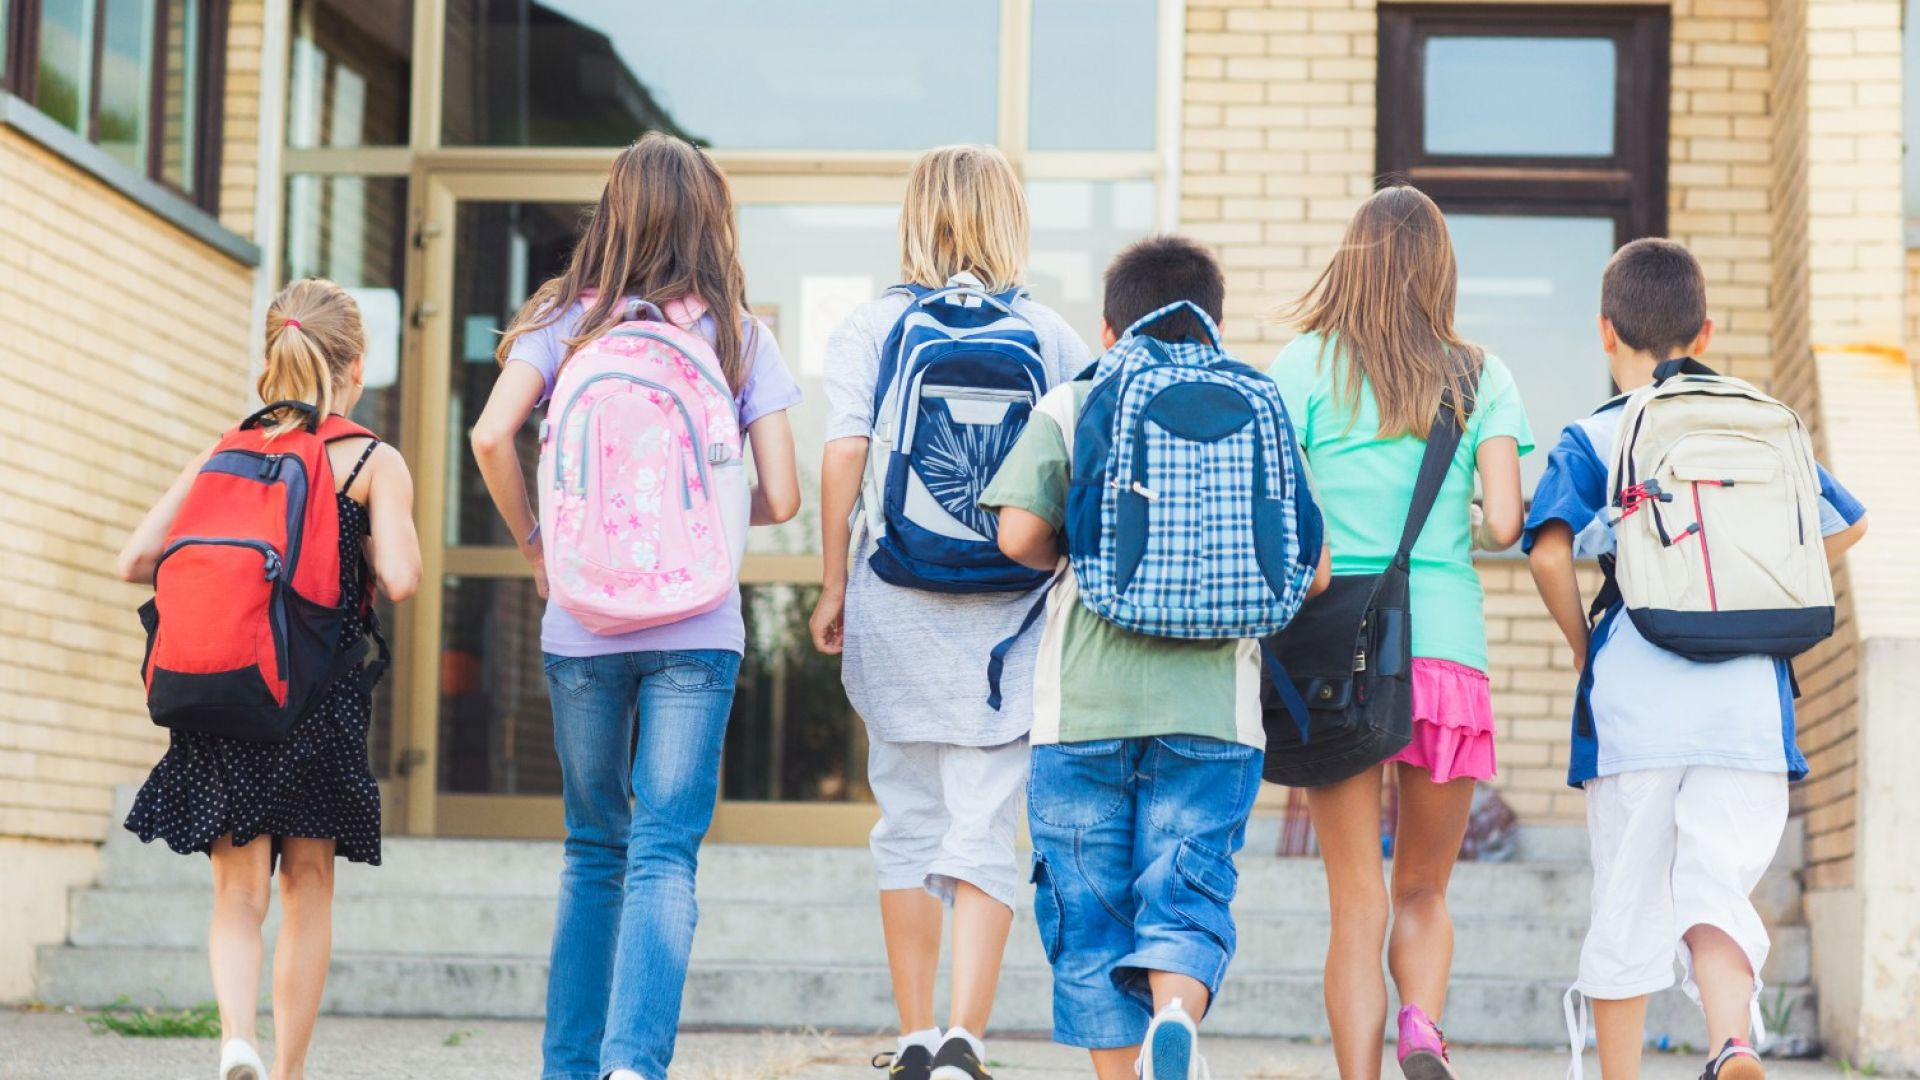 Заради тежките раници: Поставят шкафчета за учениците до VII клас